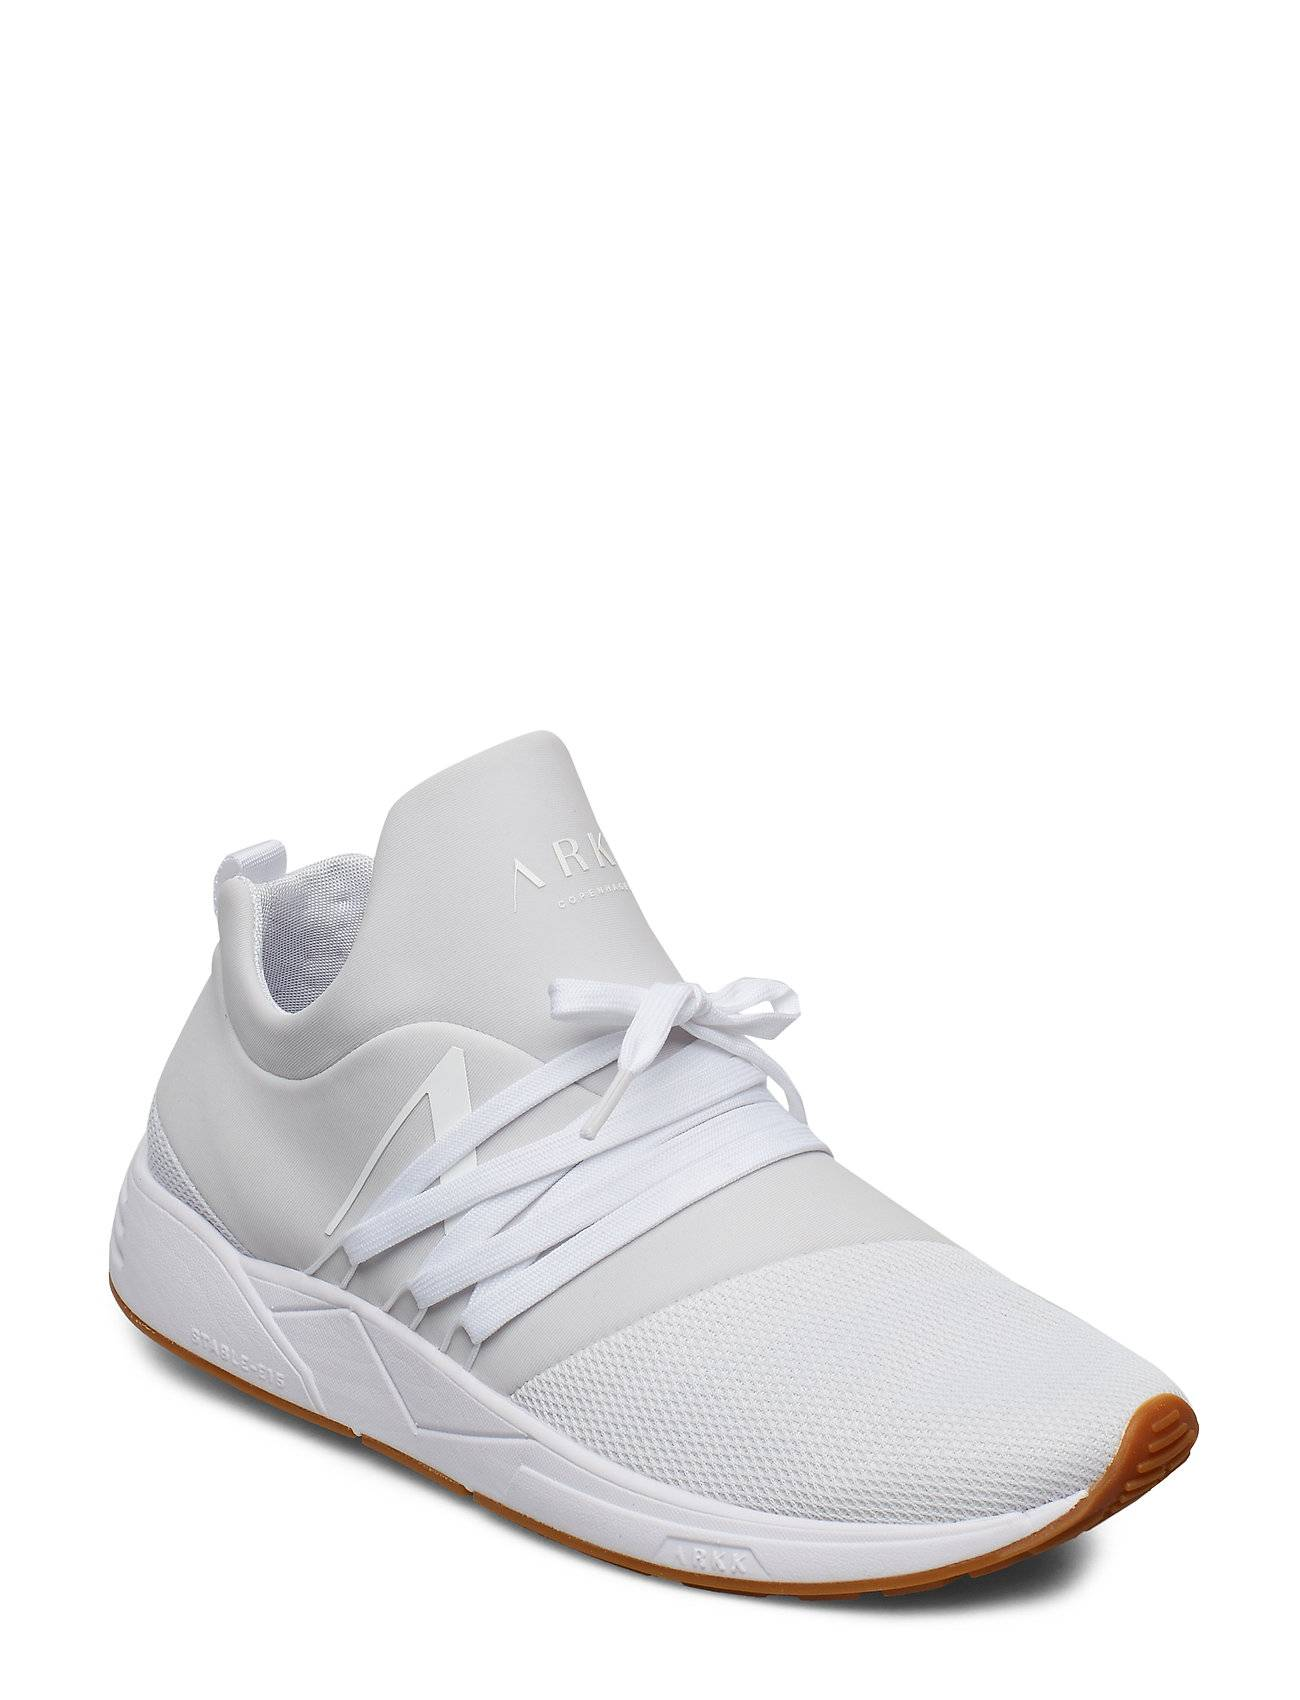 ARKK Copenhagen Raven Mesh S-E15 White Gum - Men Matalavartiset Sneakerit Tennarit Valkoinen ARKK Copenhagen